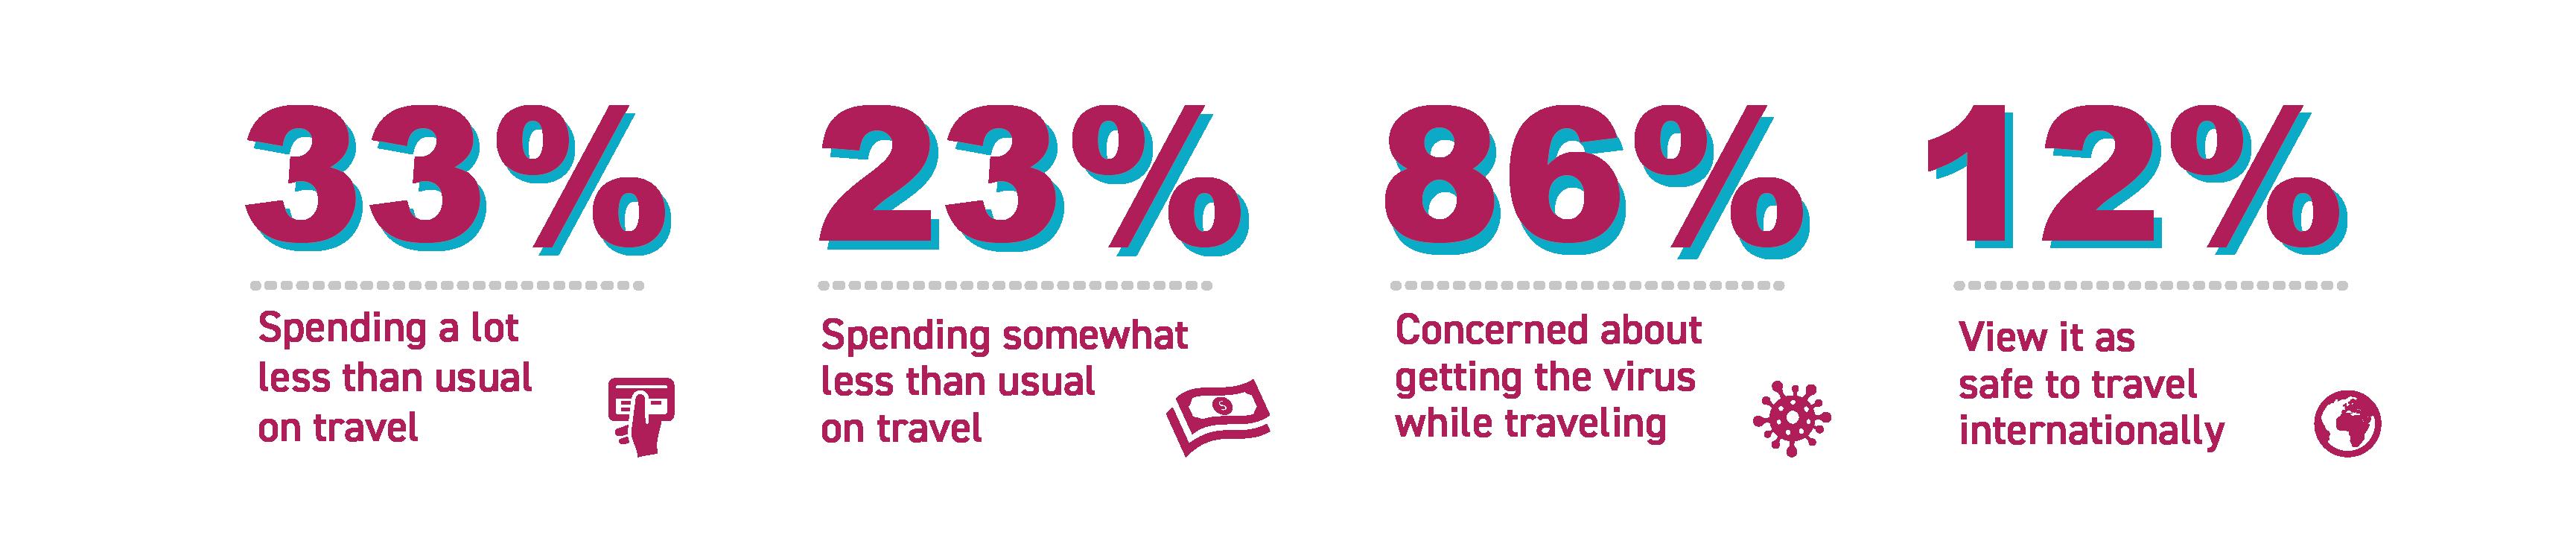 Traveler statistics